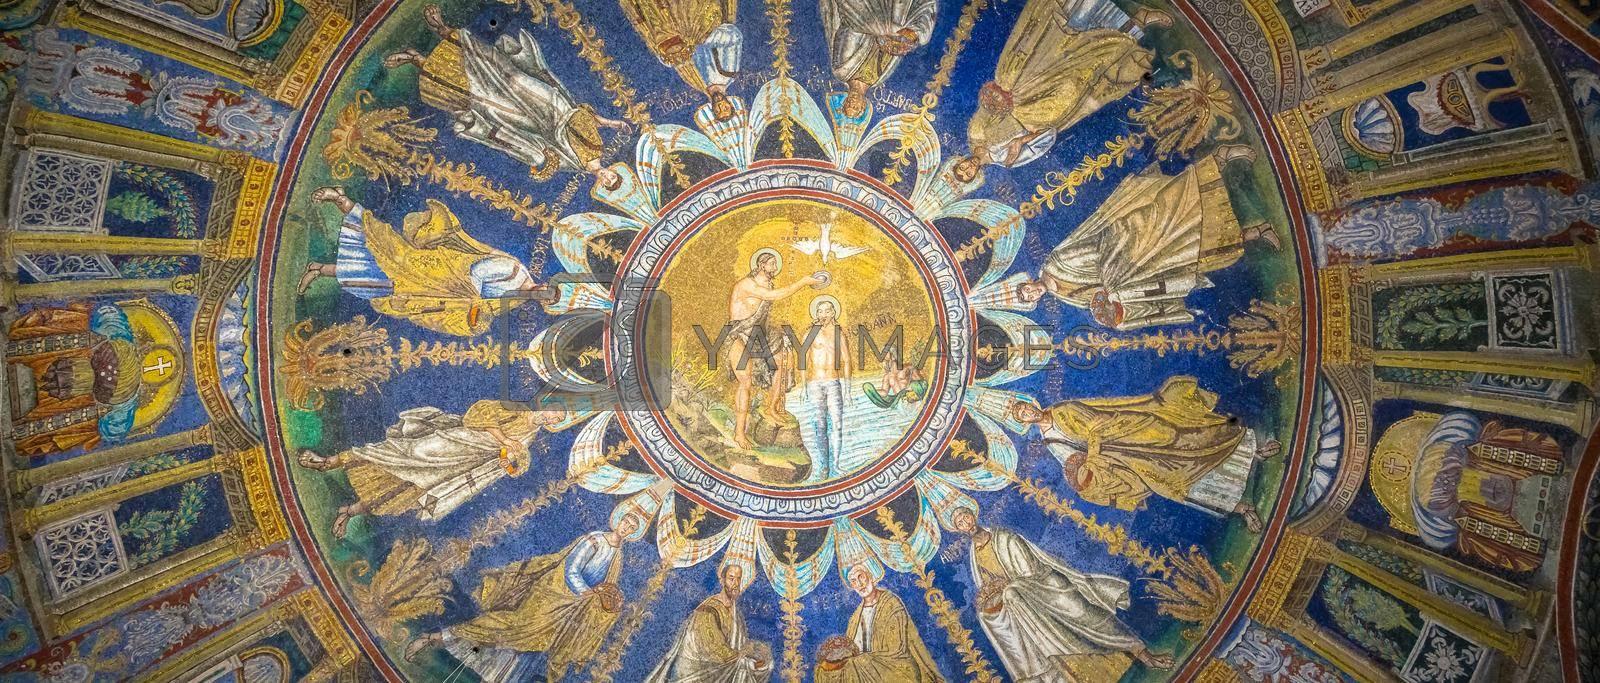 RAVENNA, ITALY - CIRCA AUGUST 2020: historic byzantine mosaic in Saint Vitale Basilica